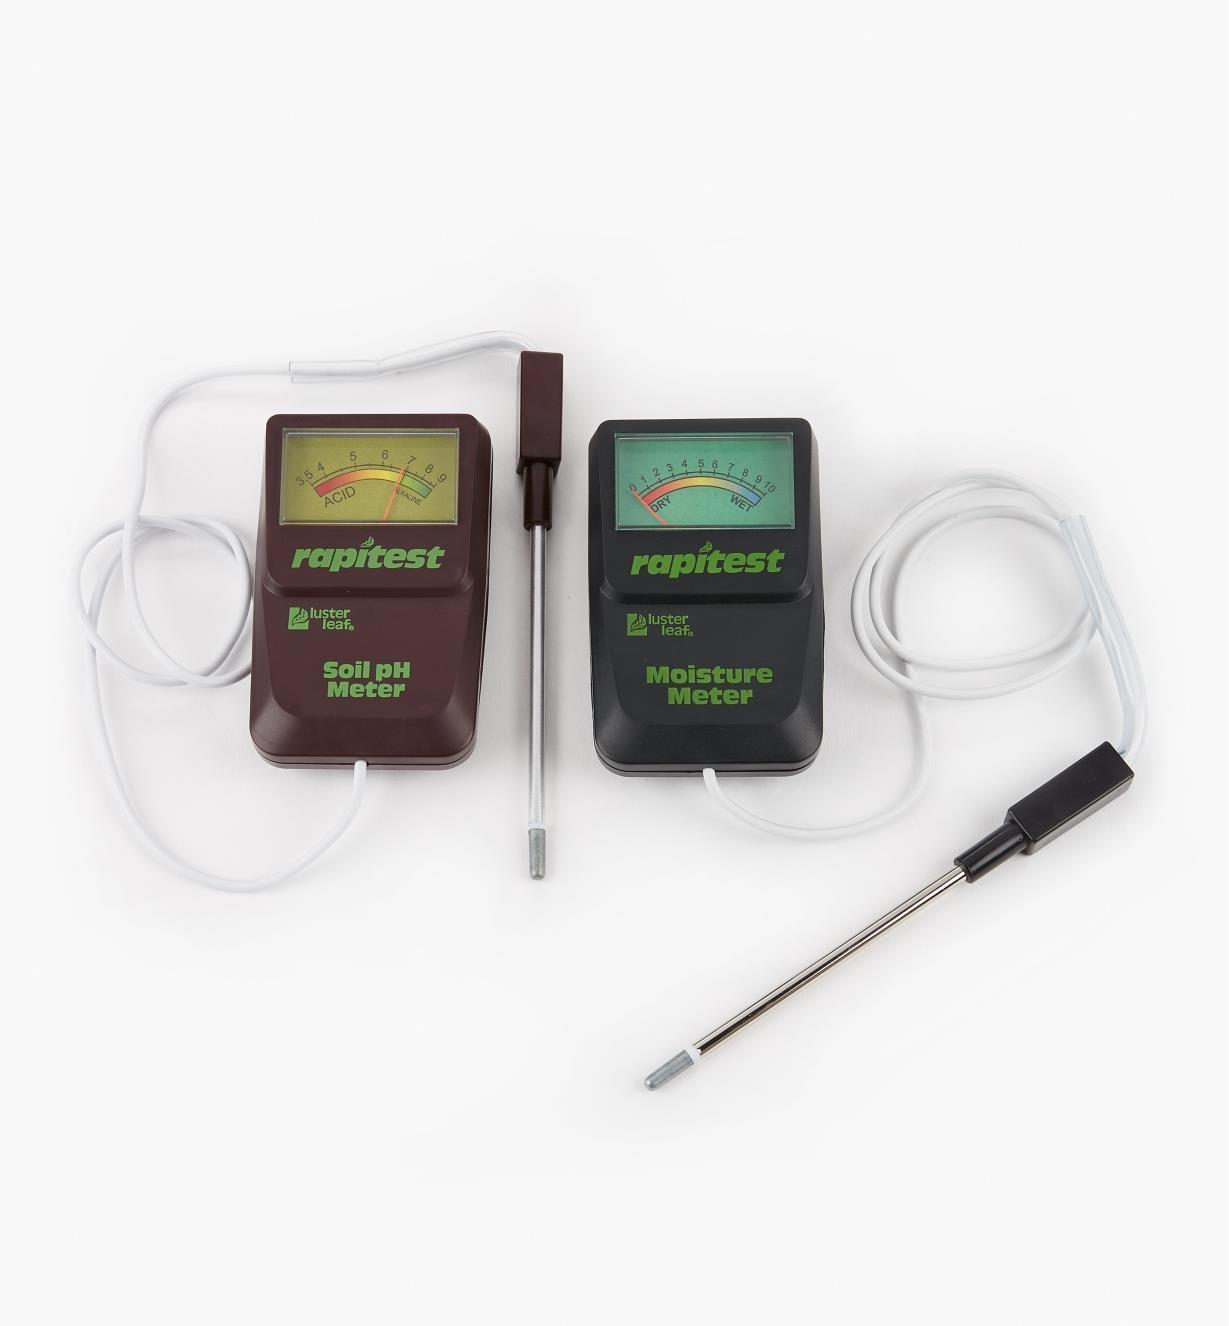 AB929 - Soil pH Meter & Moisture Meter